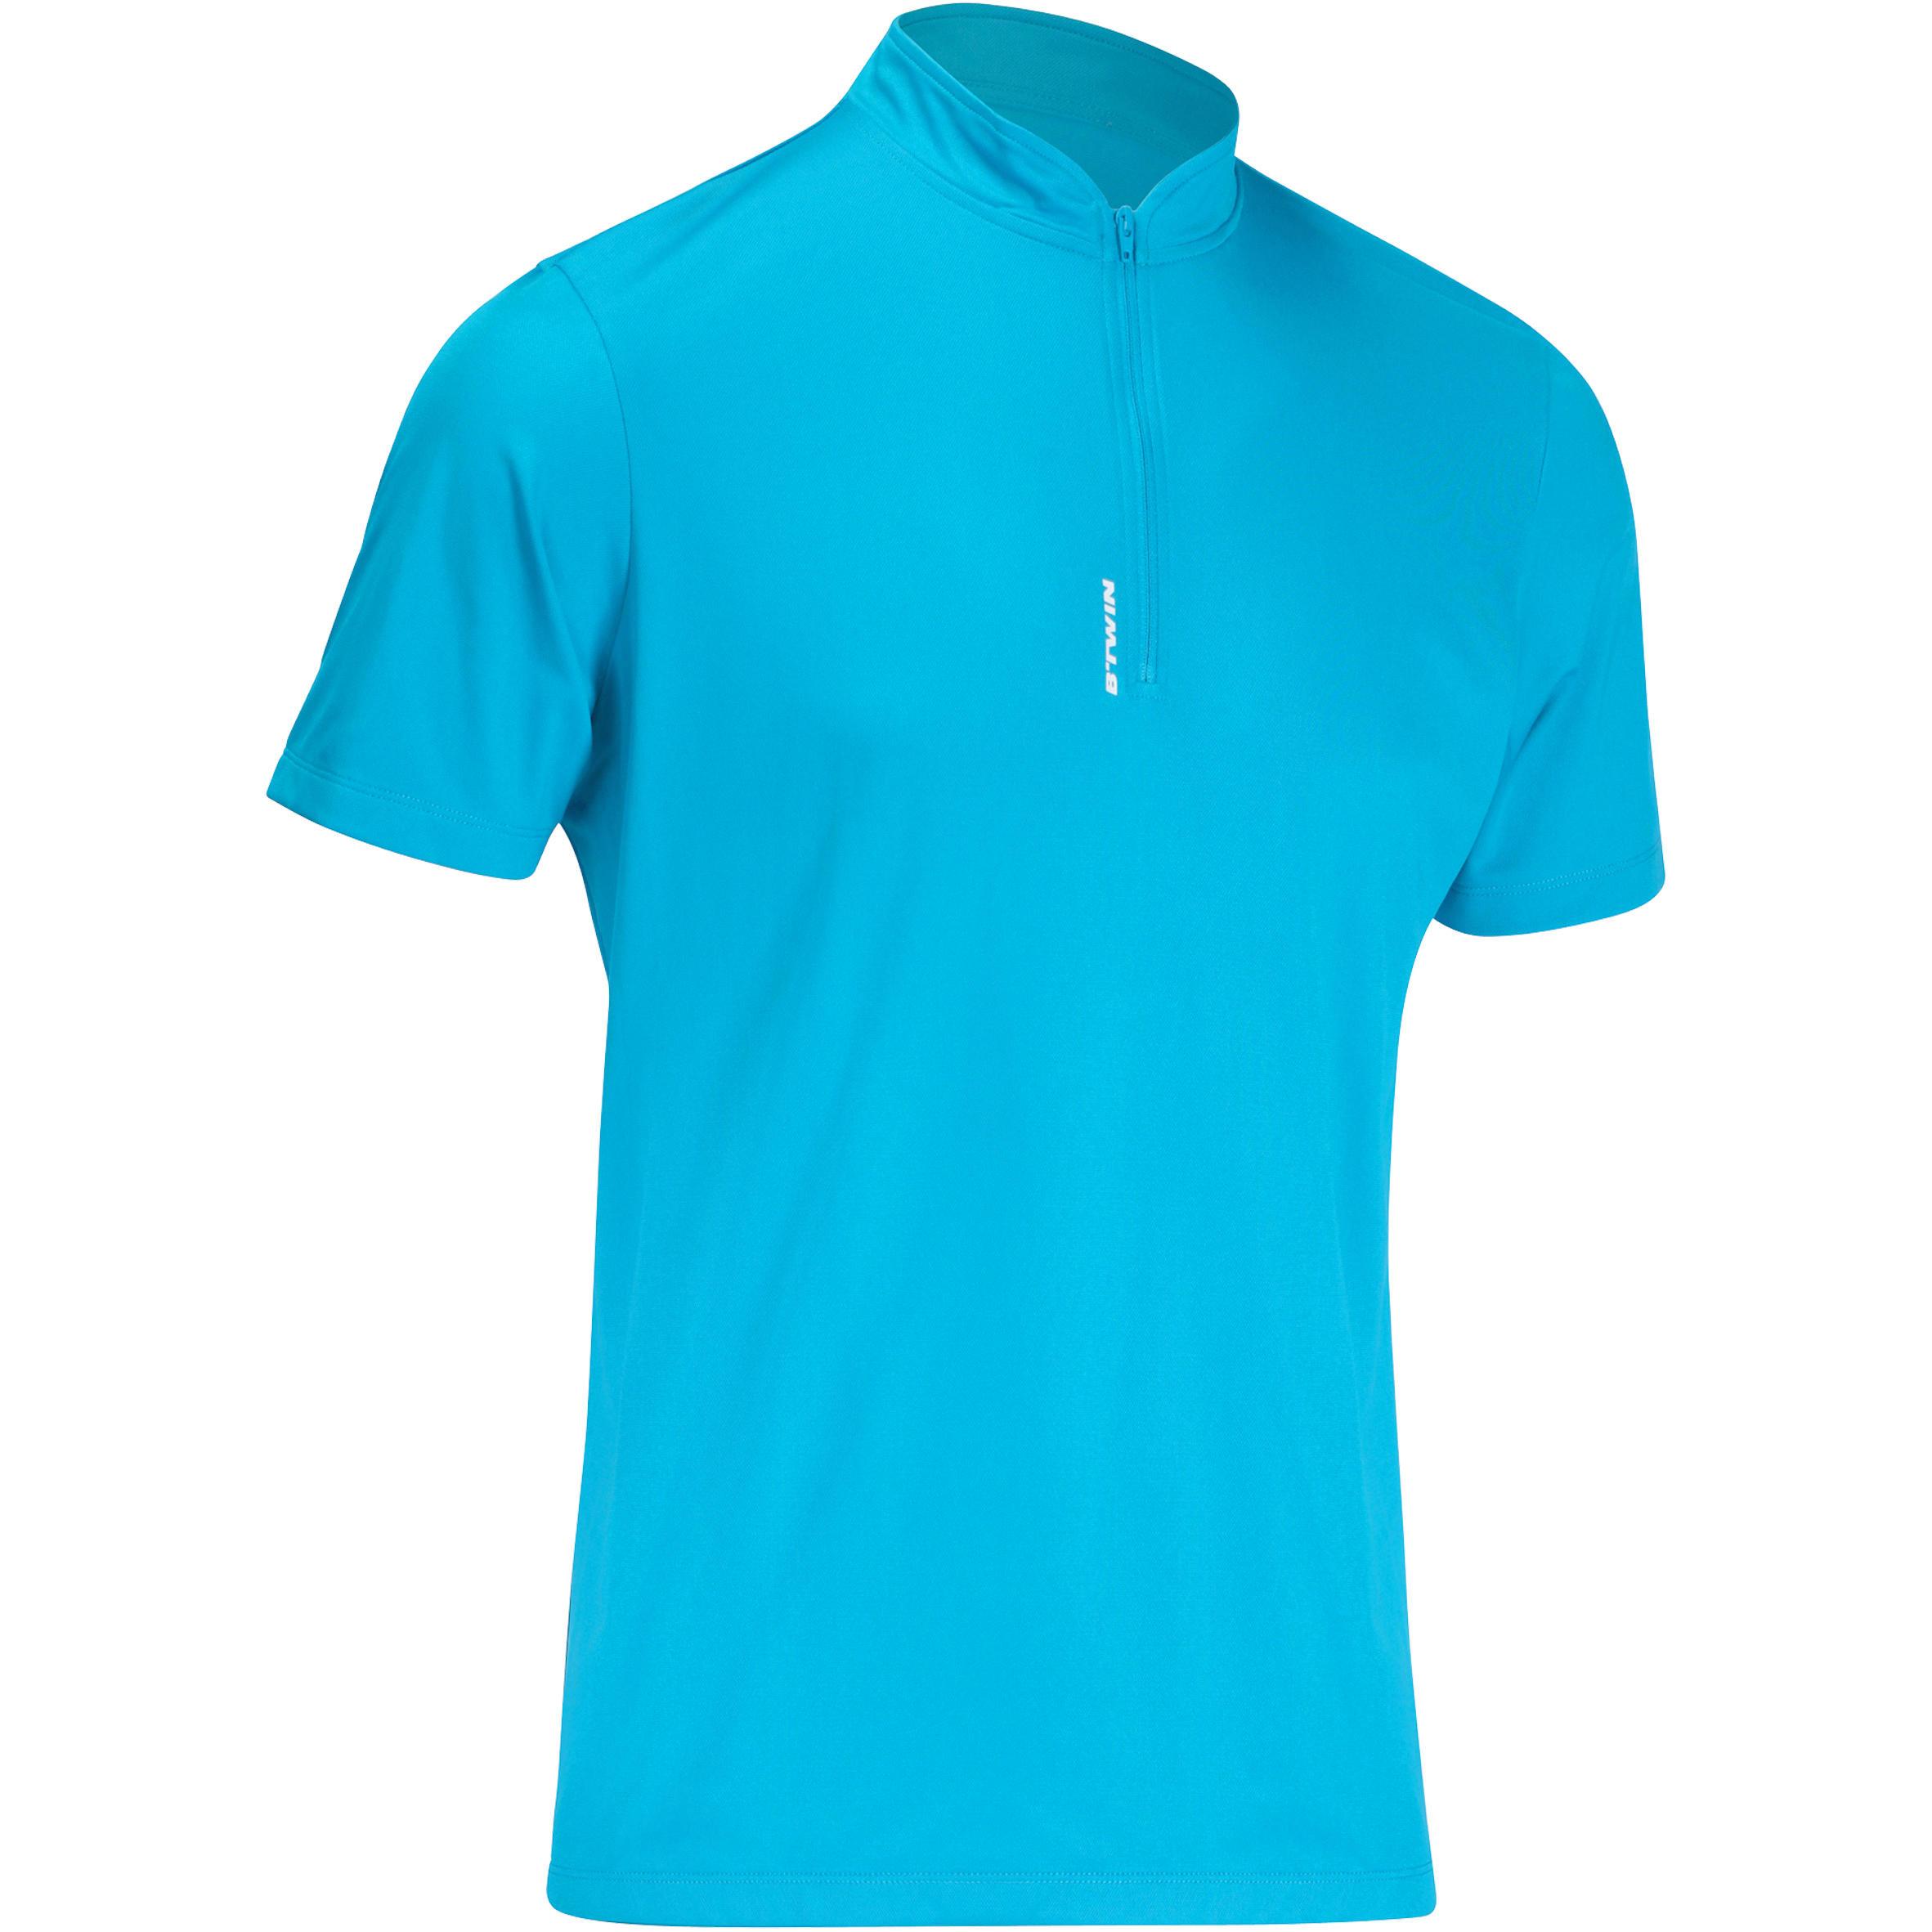 Camiseta manga corta bicicleta caballero 300 azul